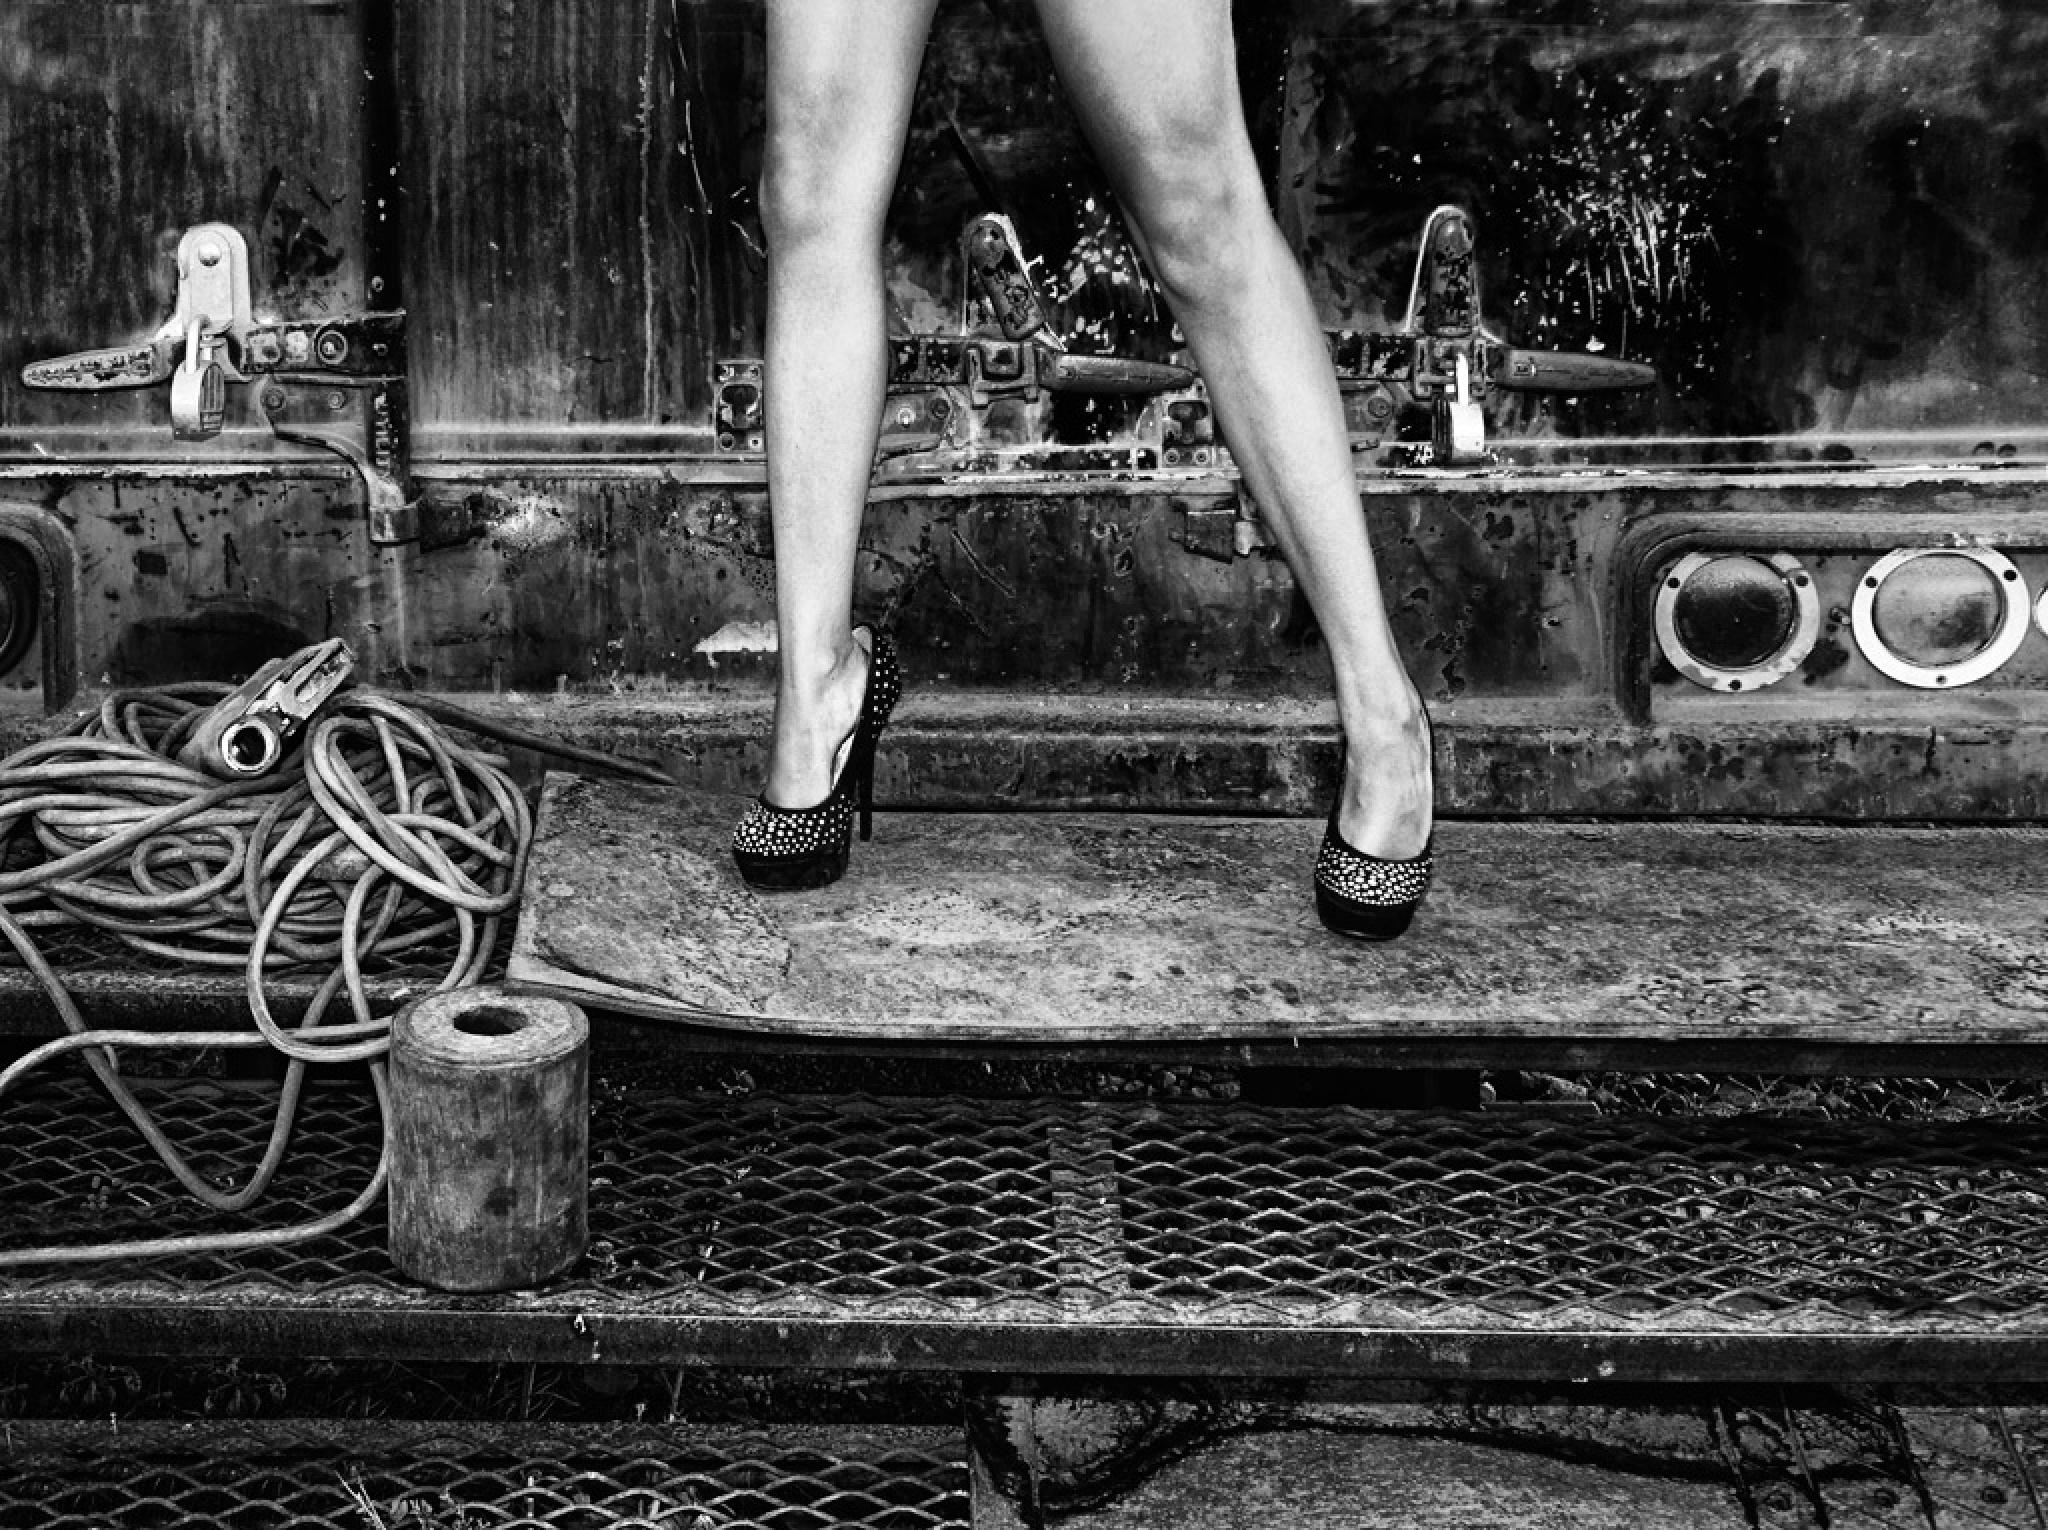 Legs by whitetigertom